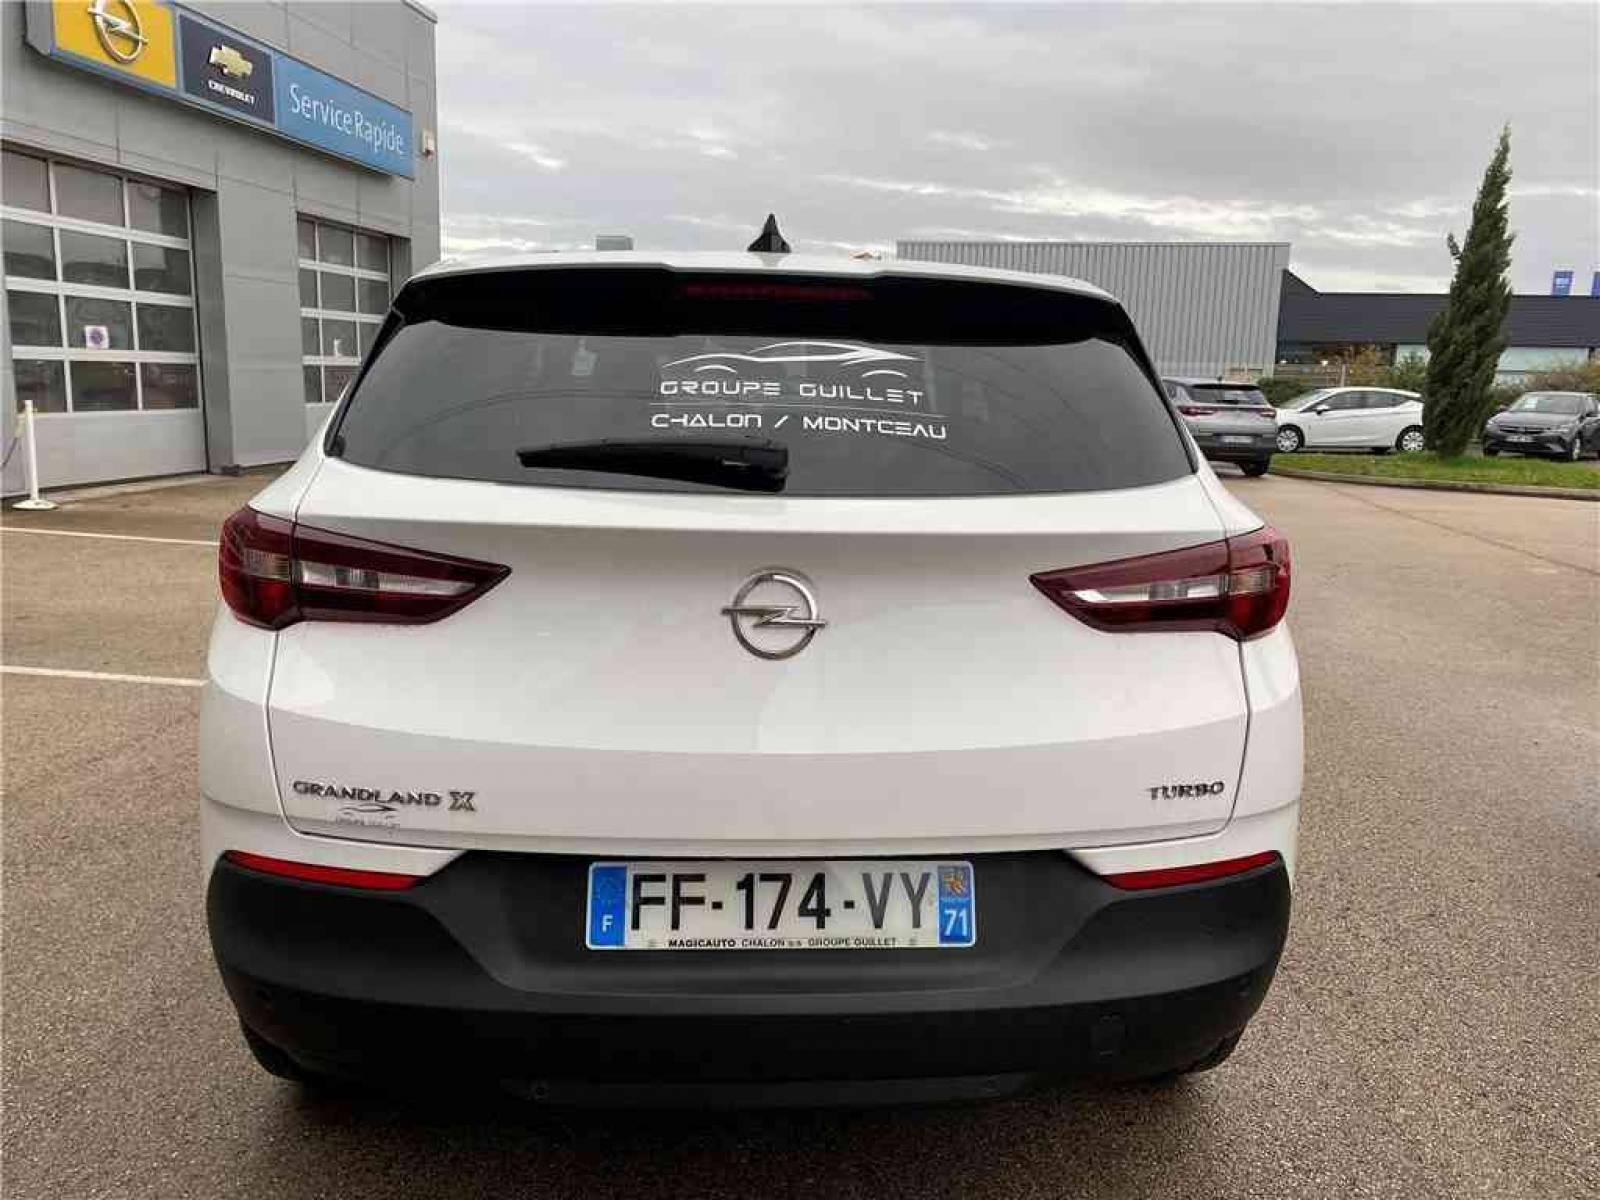 OPEL Grandland X 1.2 Turbo 130 ch - véhicule d'occasion - Groupe Guillet - Opel Magicauto - Chalon-sur-Saône - 71380 - Saint-Marcel - 33